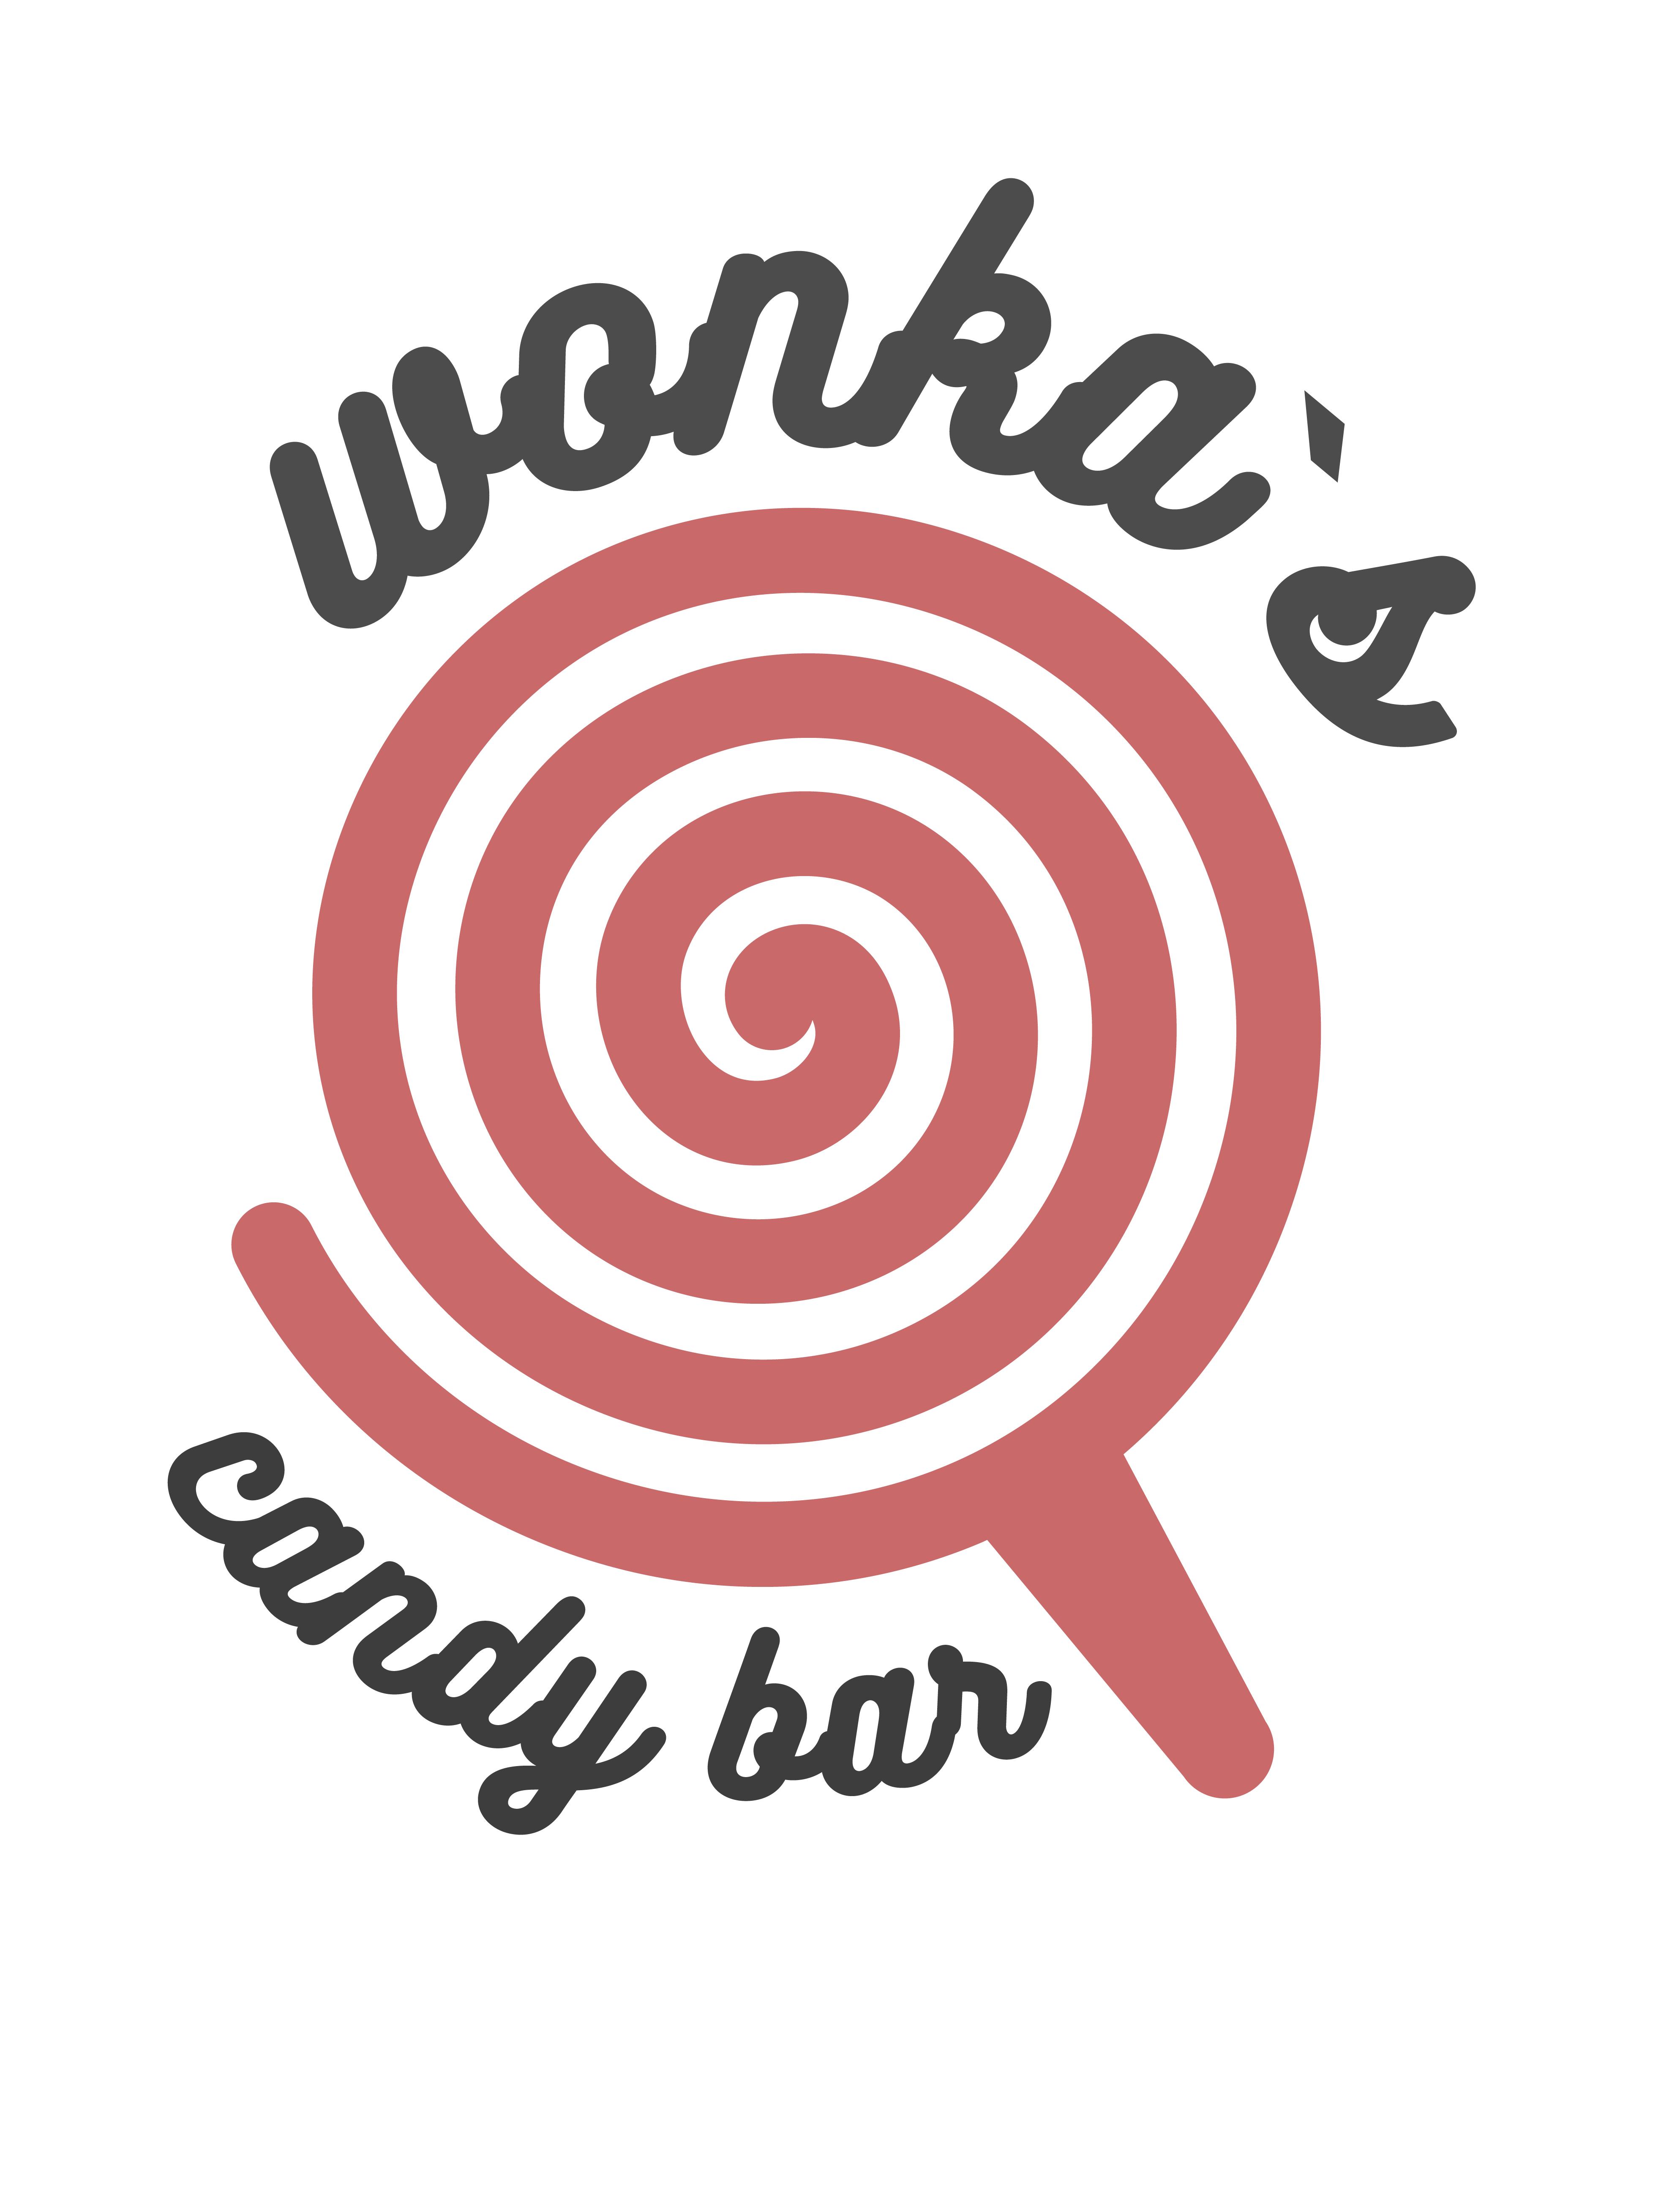 Разработка логотипа магазина сладостей со всего мира. фото f_9105a28ef97f29cd.png